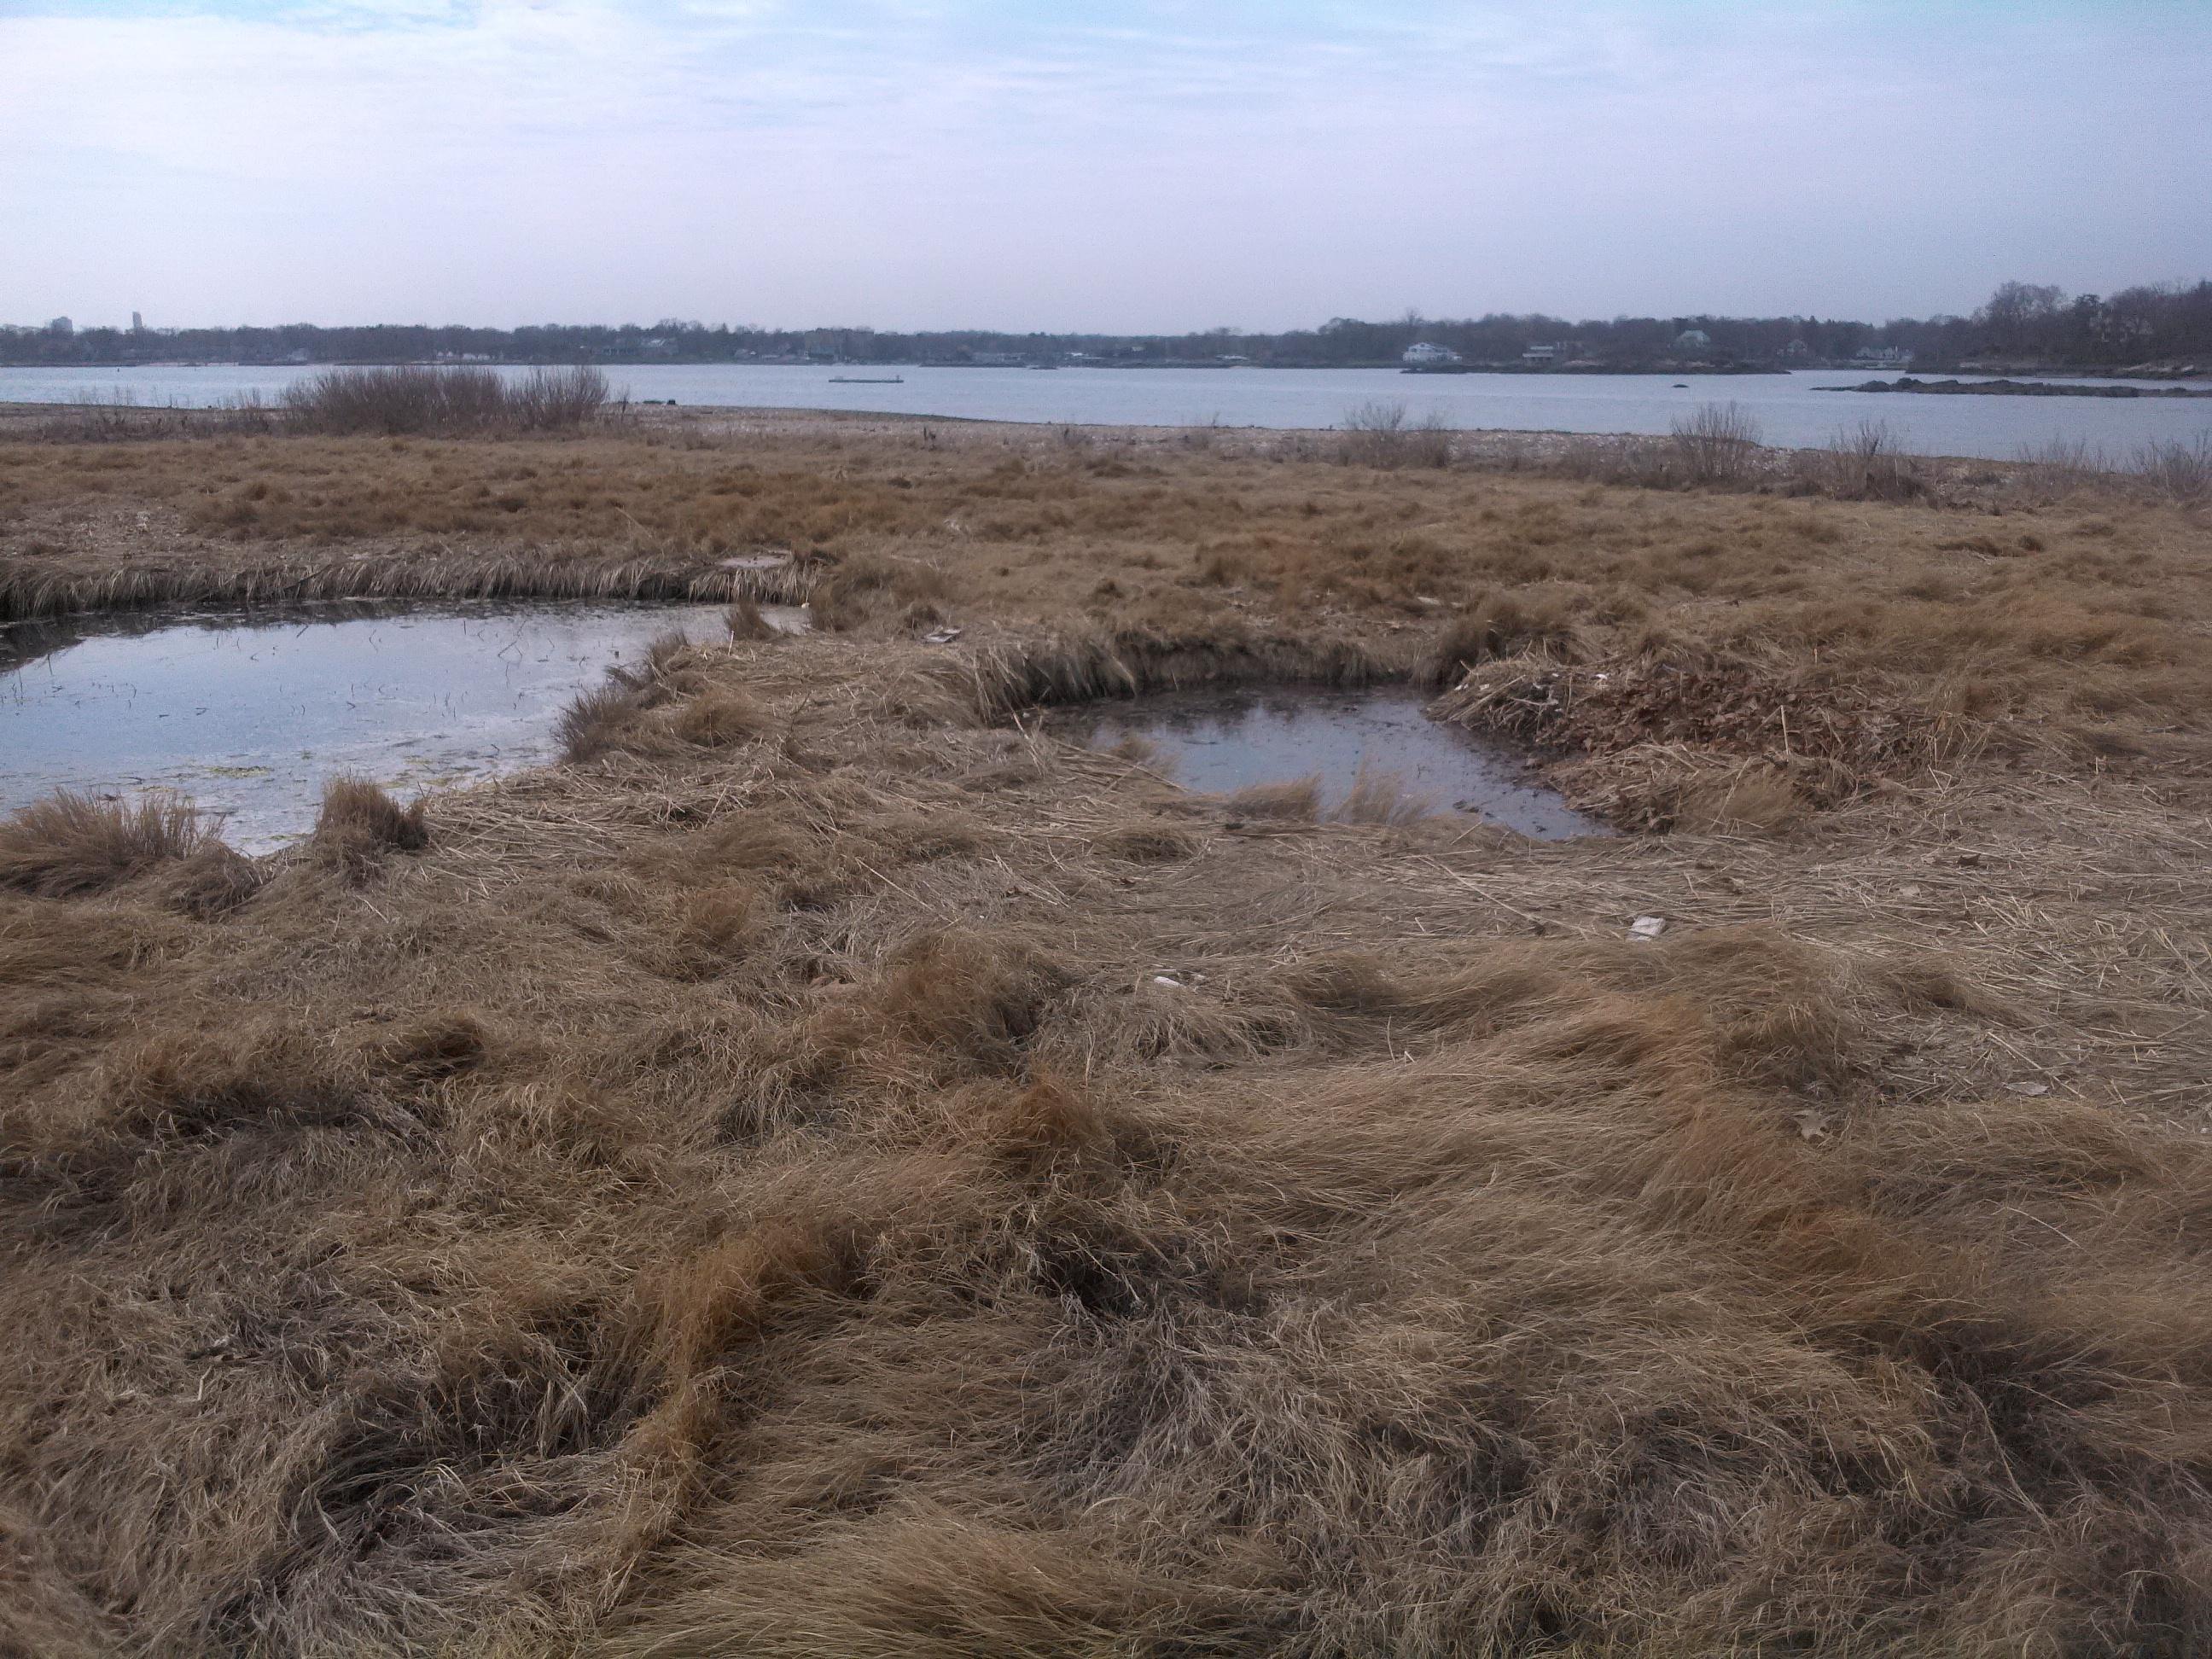 Volpe filling in wetlands 1